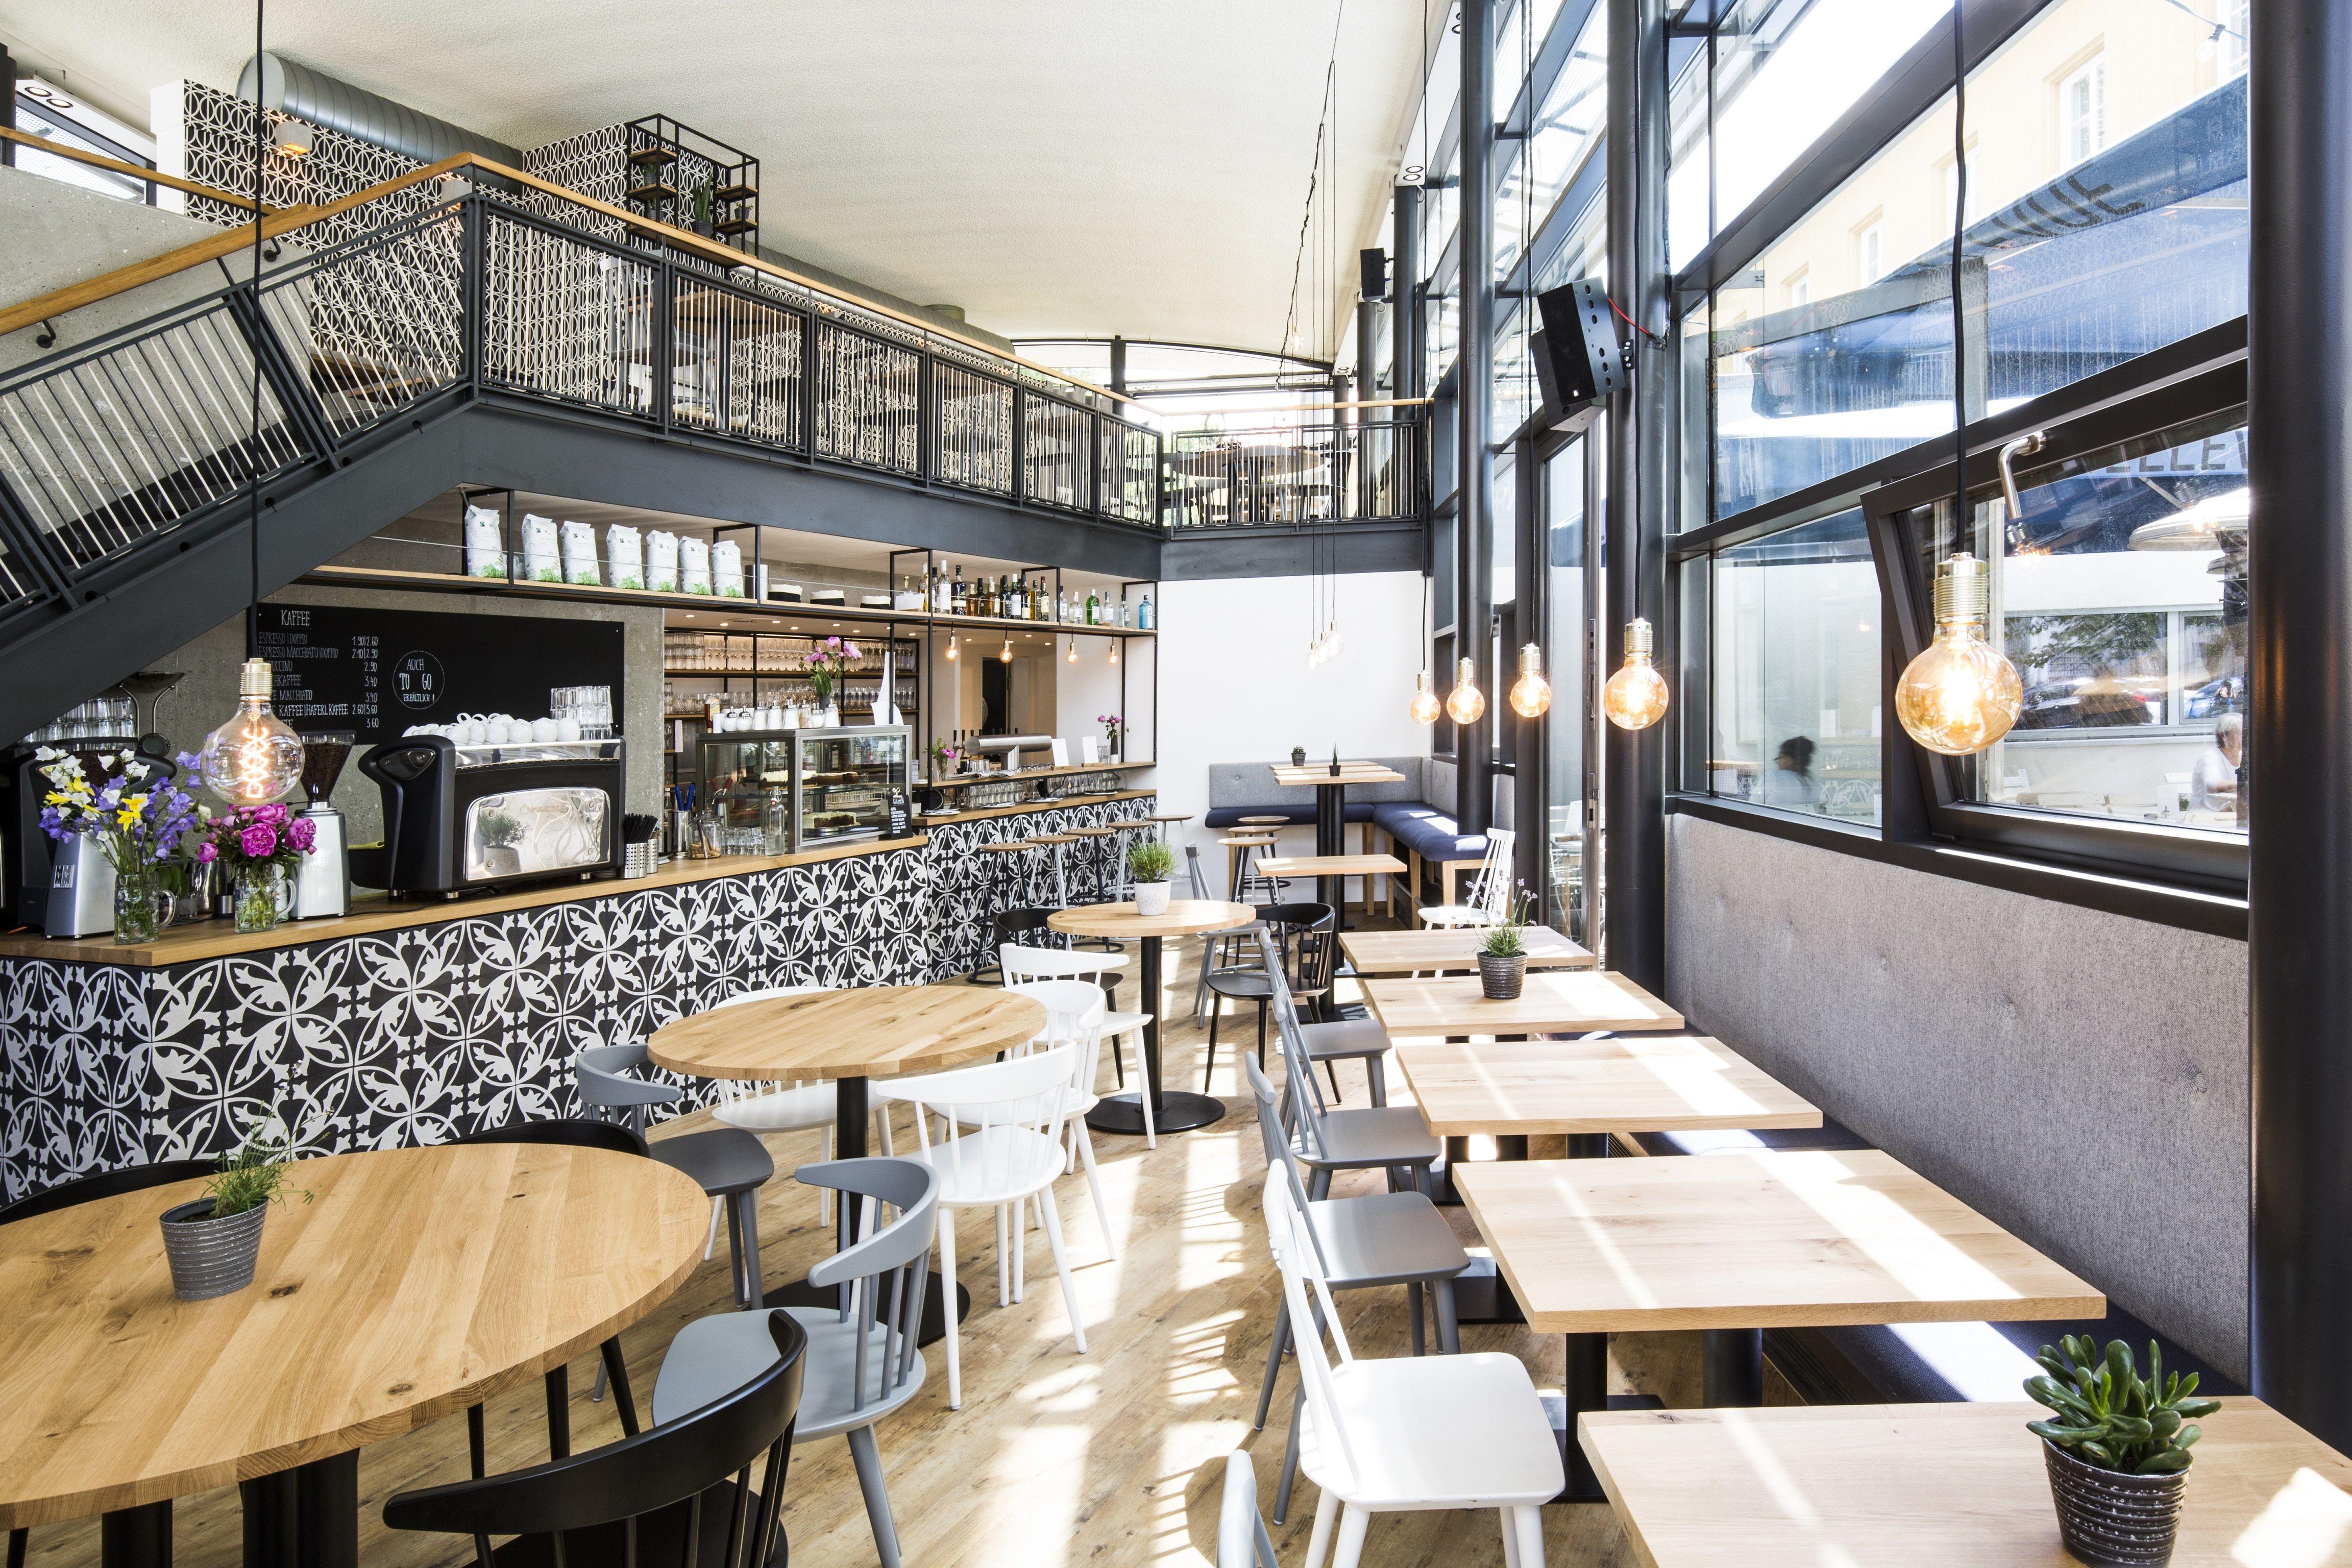 Bellevue - Café - Restaurant - Bar - Interior Design - Studio Yaya ...